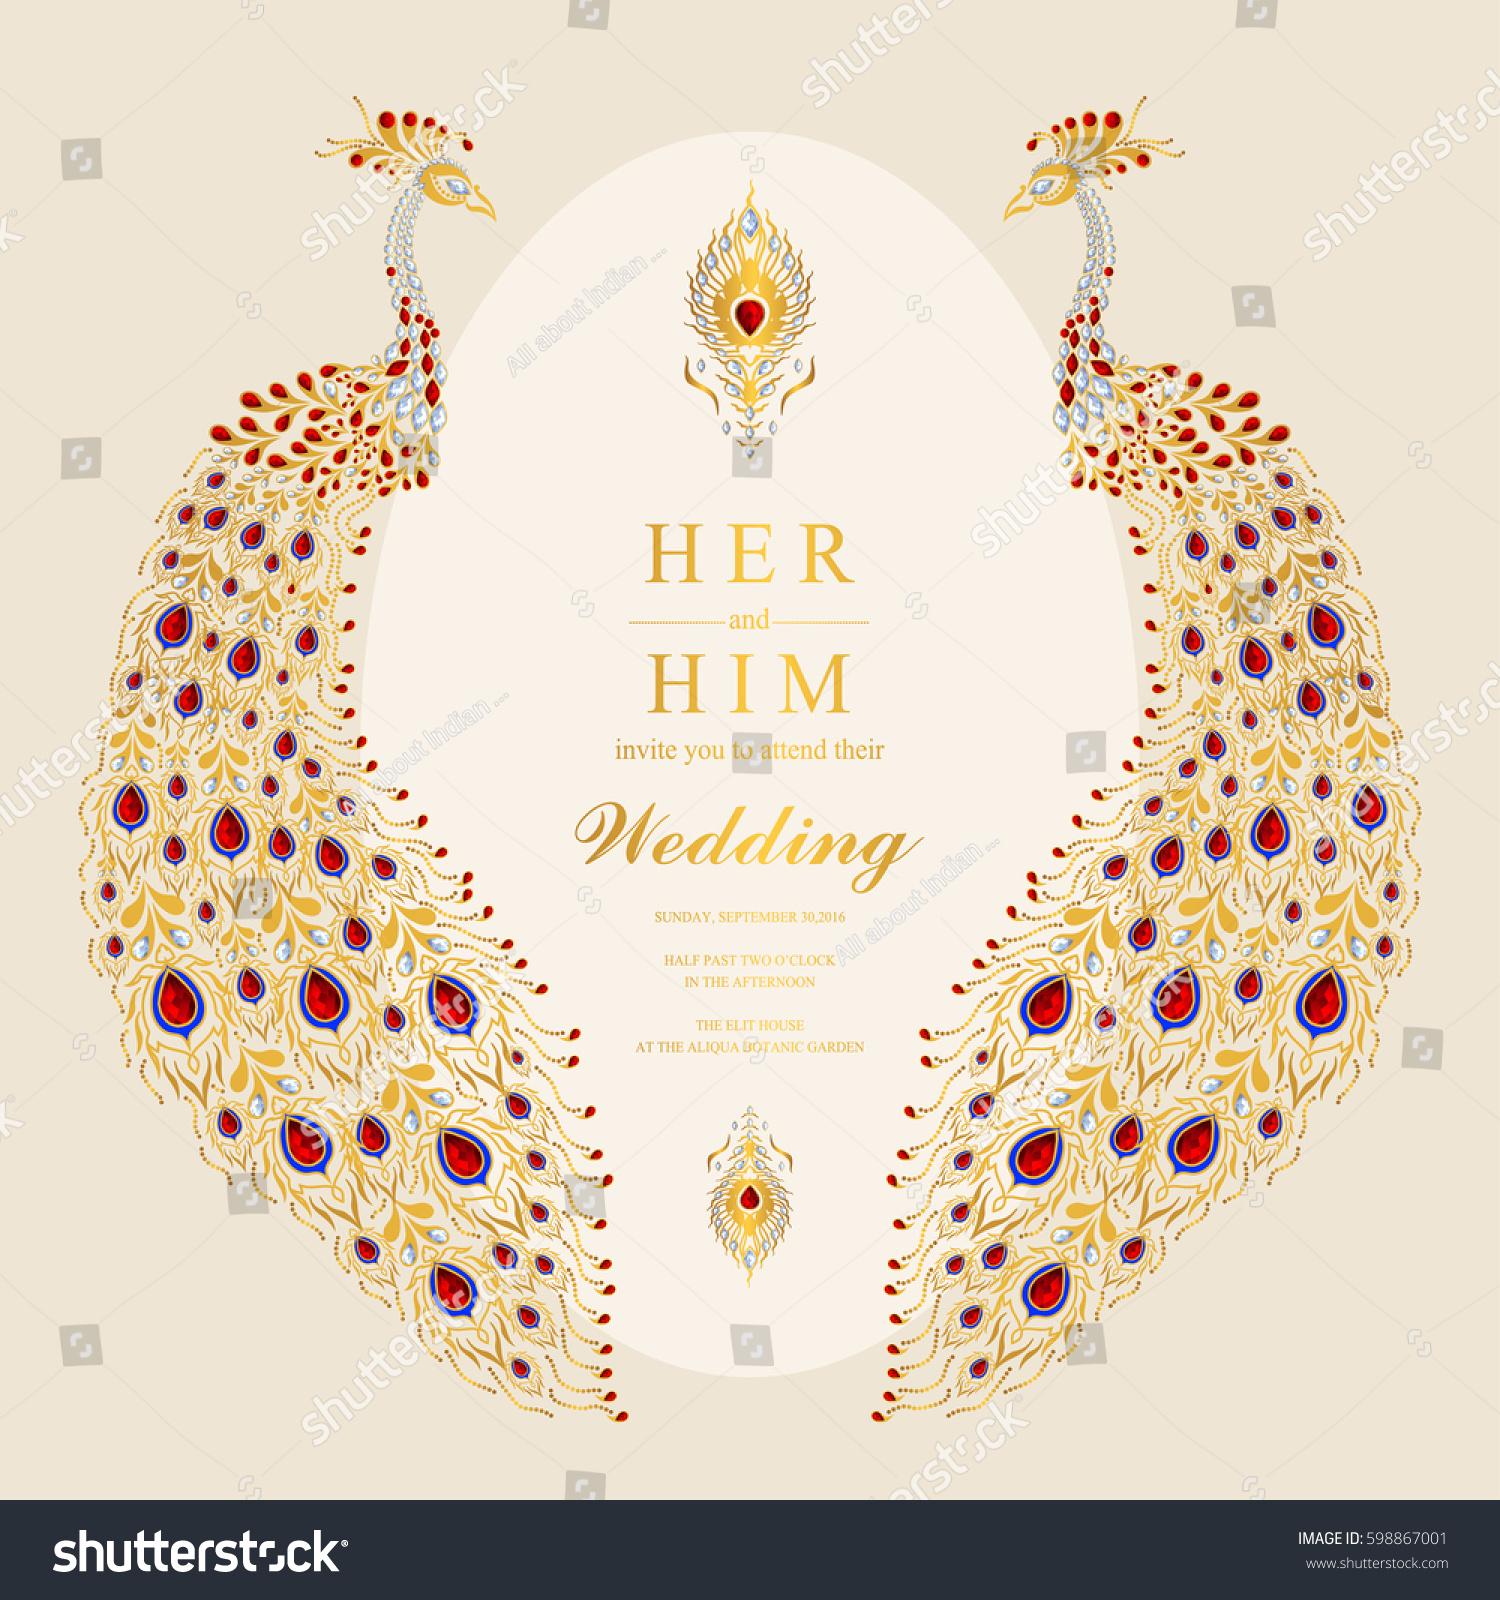 wedding invitation card samples